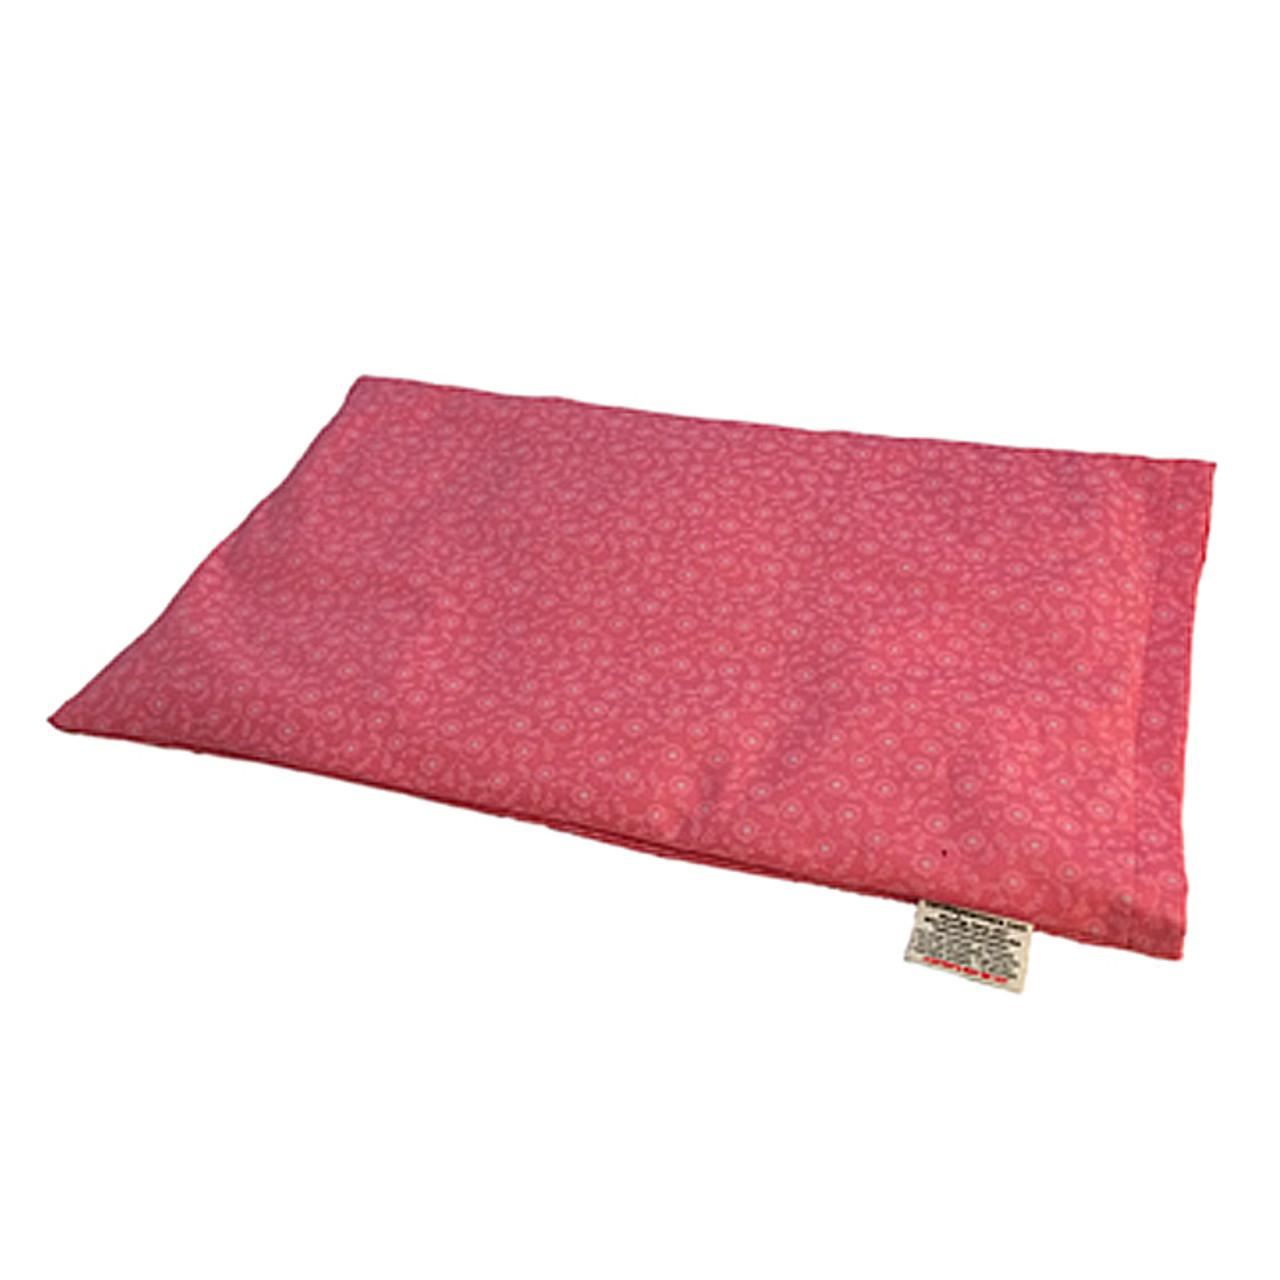 Lap Warmer Microwaveable  Corn Heating Pad - Dusty Pink Roses